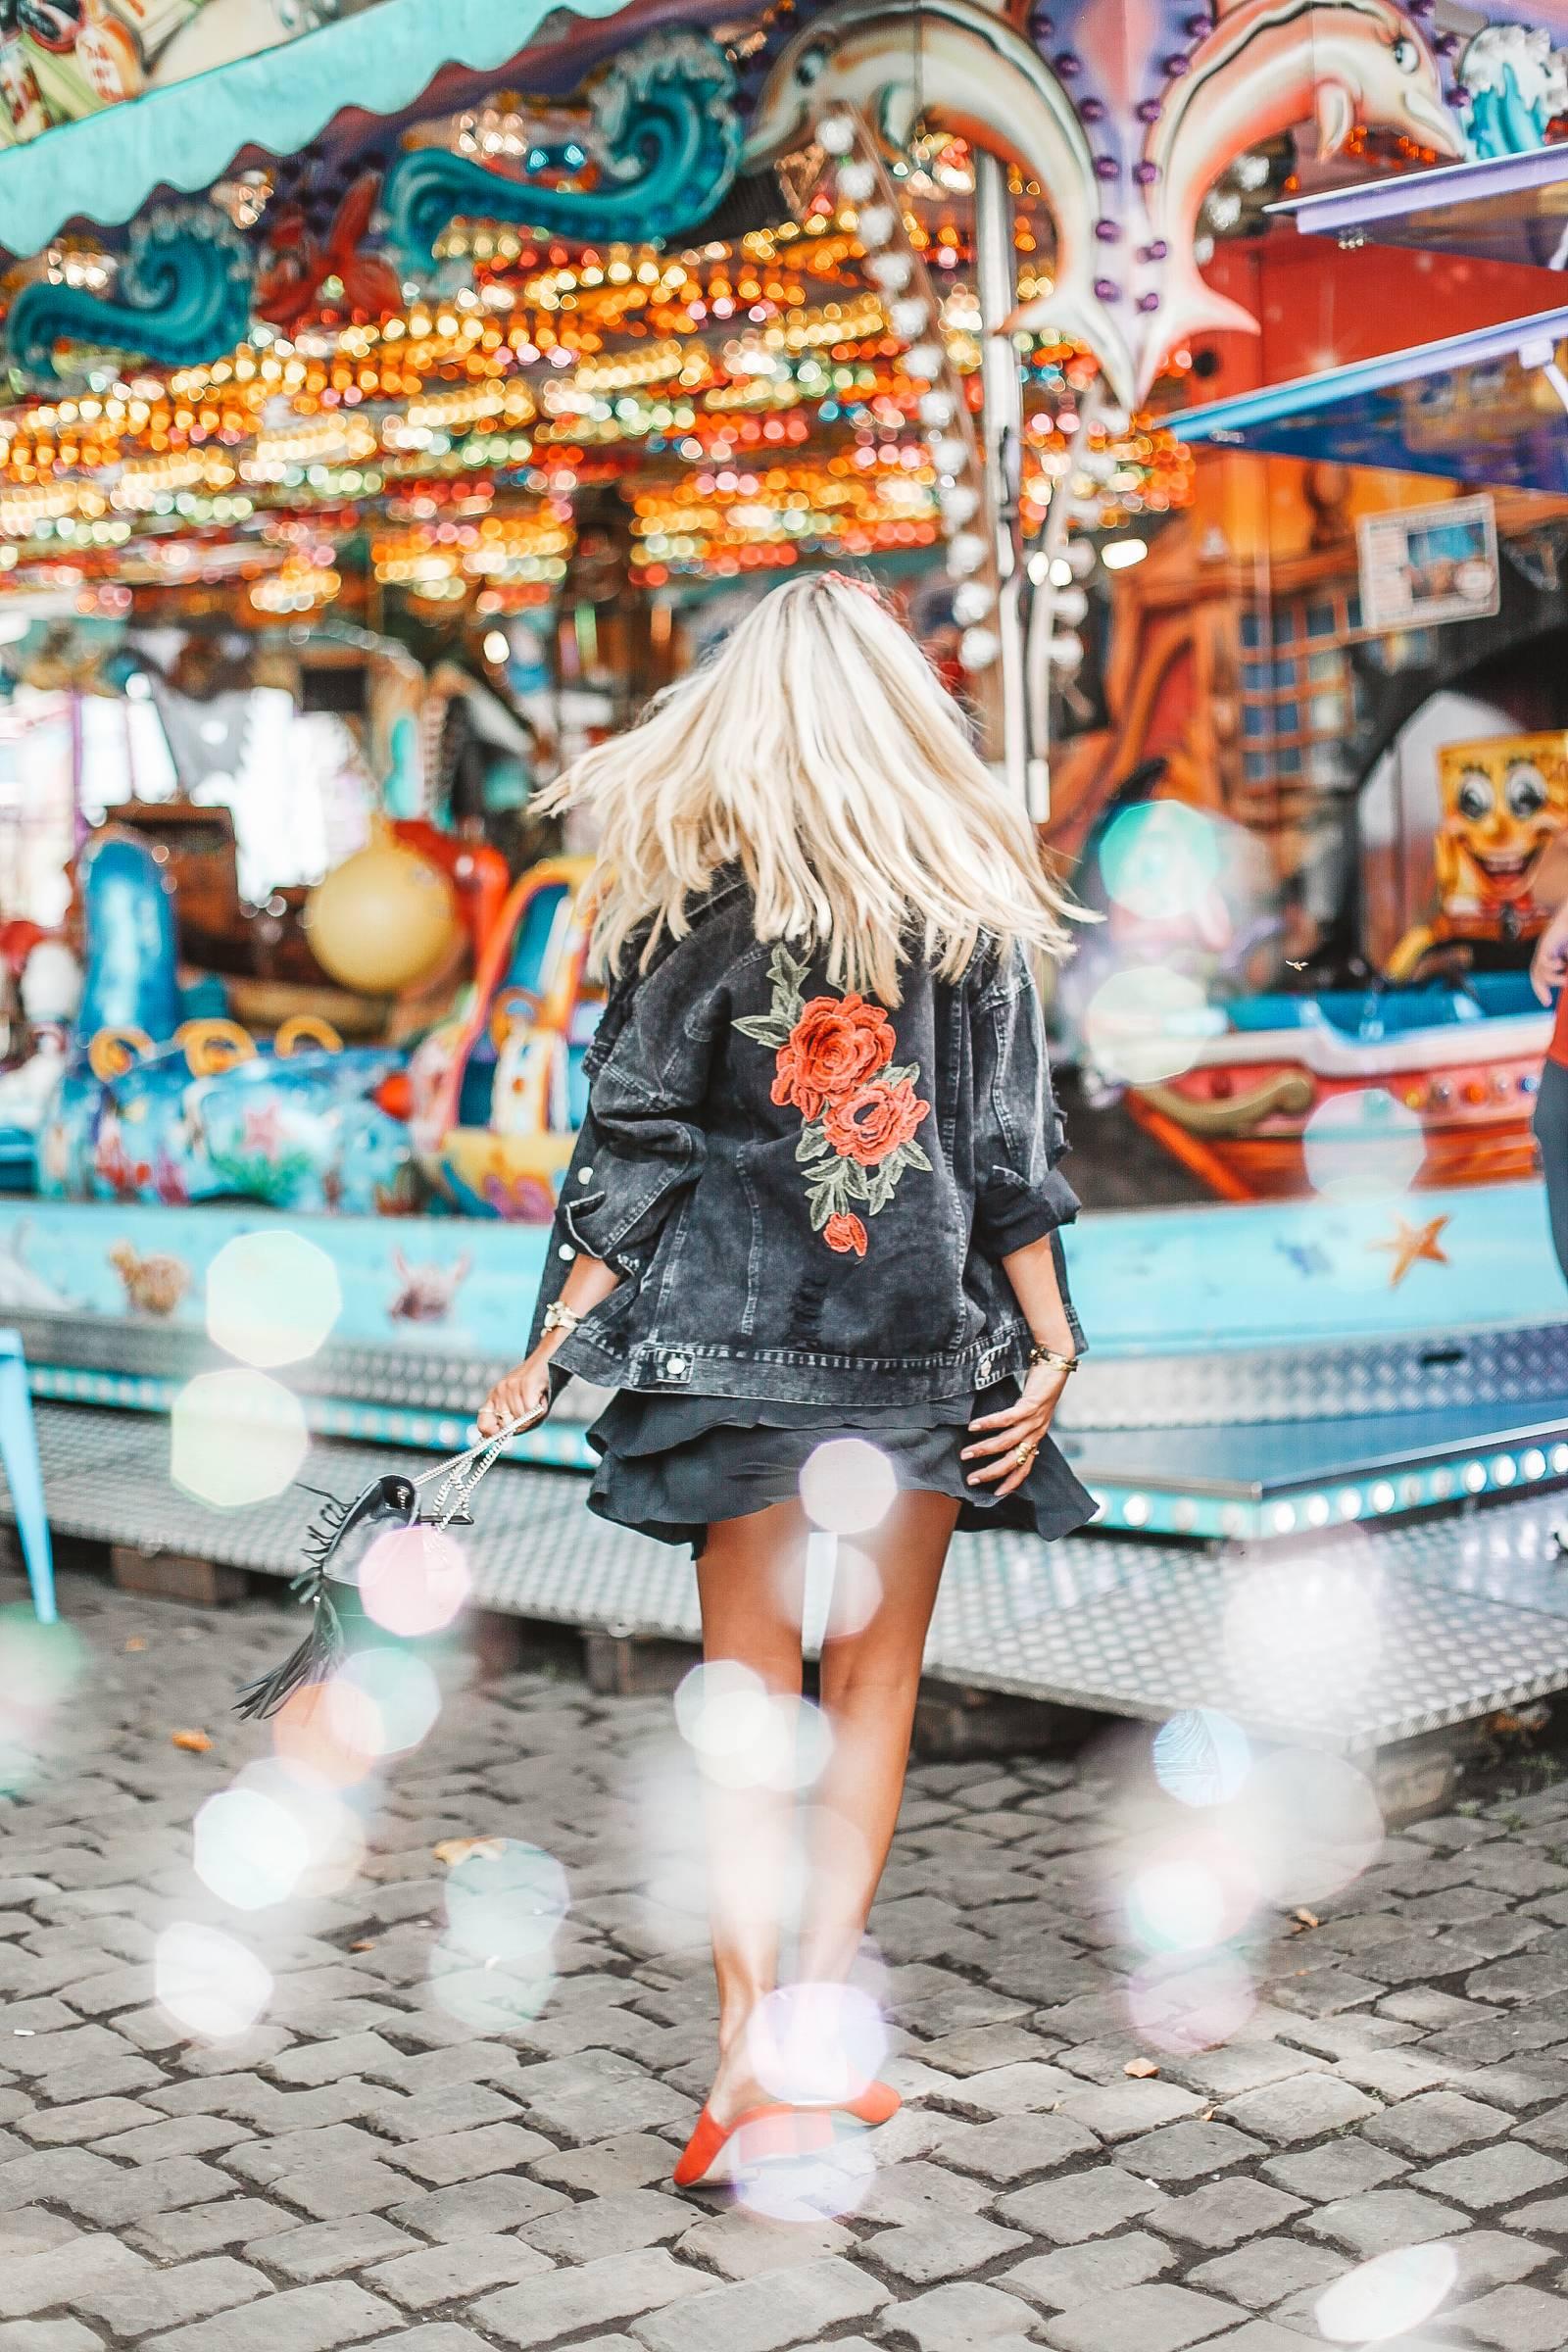 Denim jacket at the fair